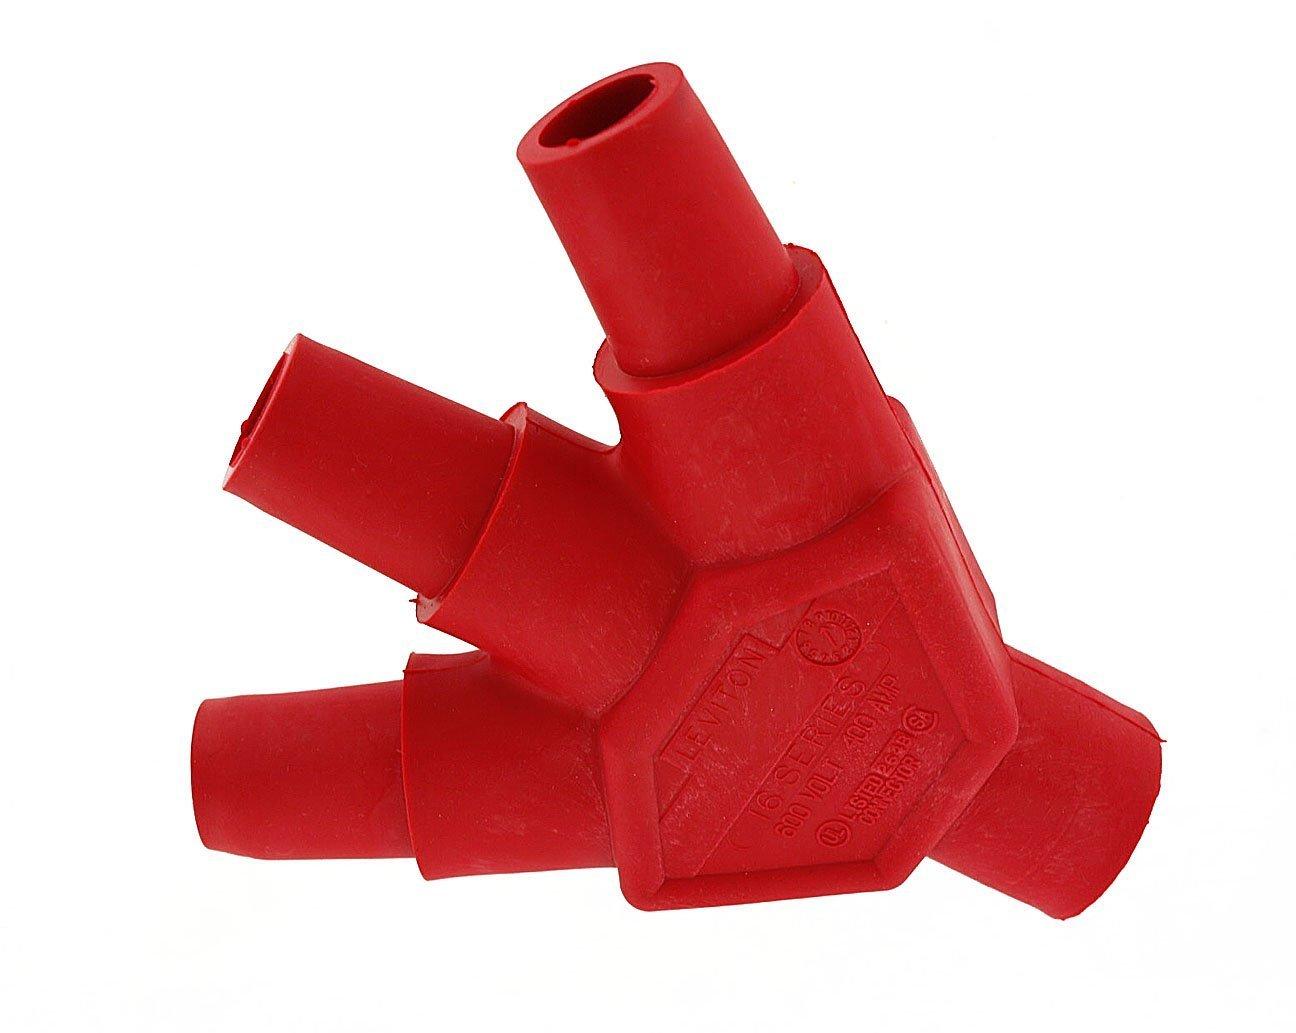 Leviton 16A23-UR 16-Series Taper Nose, Male-Female-Female-Female, Cam-Type Multi-Way Connector, Red